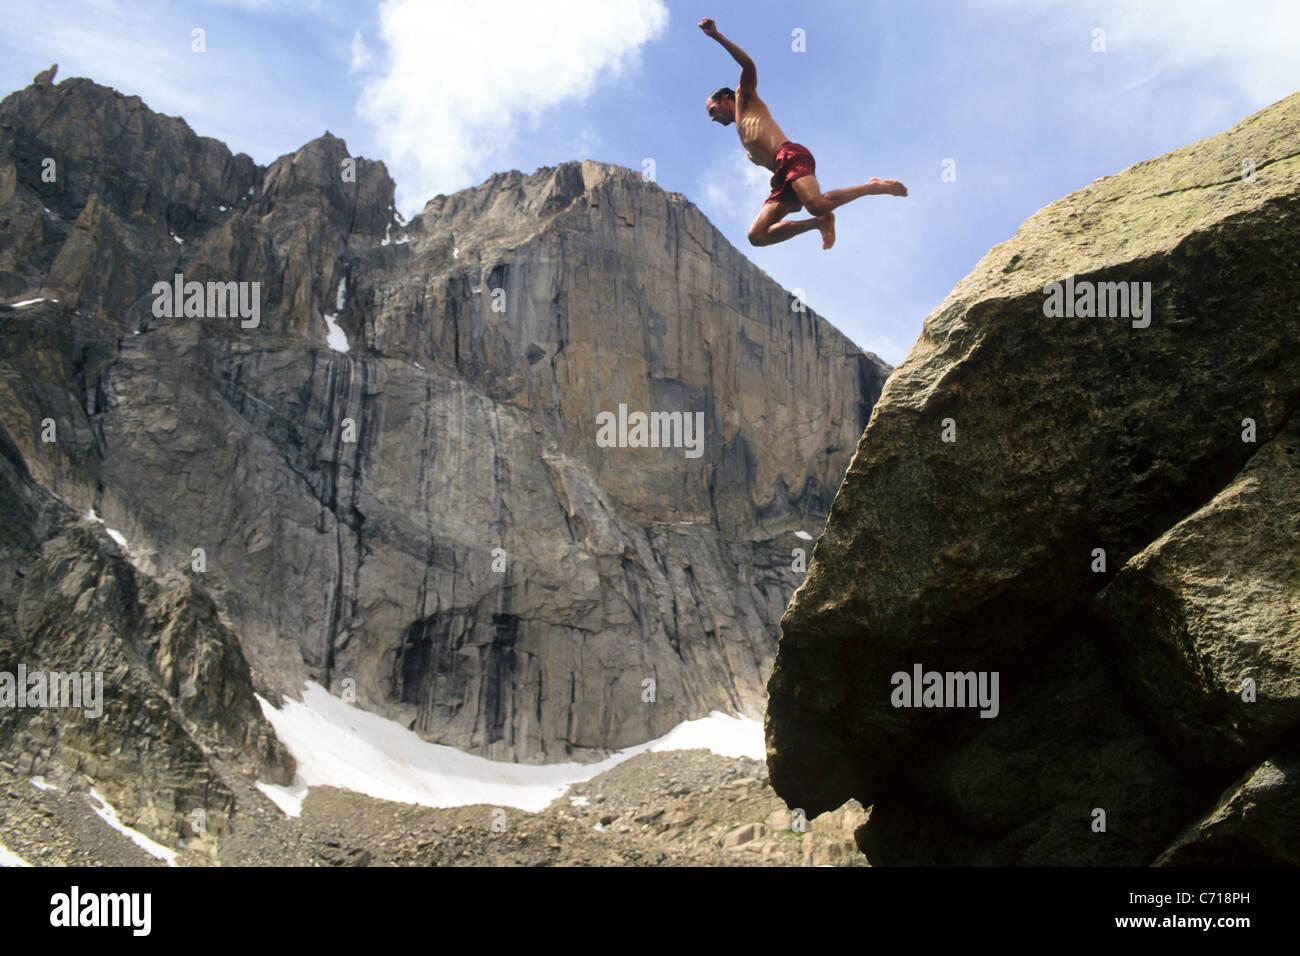 Man jumping off rock below Long's Peak, Rocky Mountain National Park, Estes Park, Colorado. - Stock Image